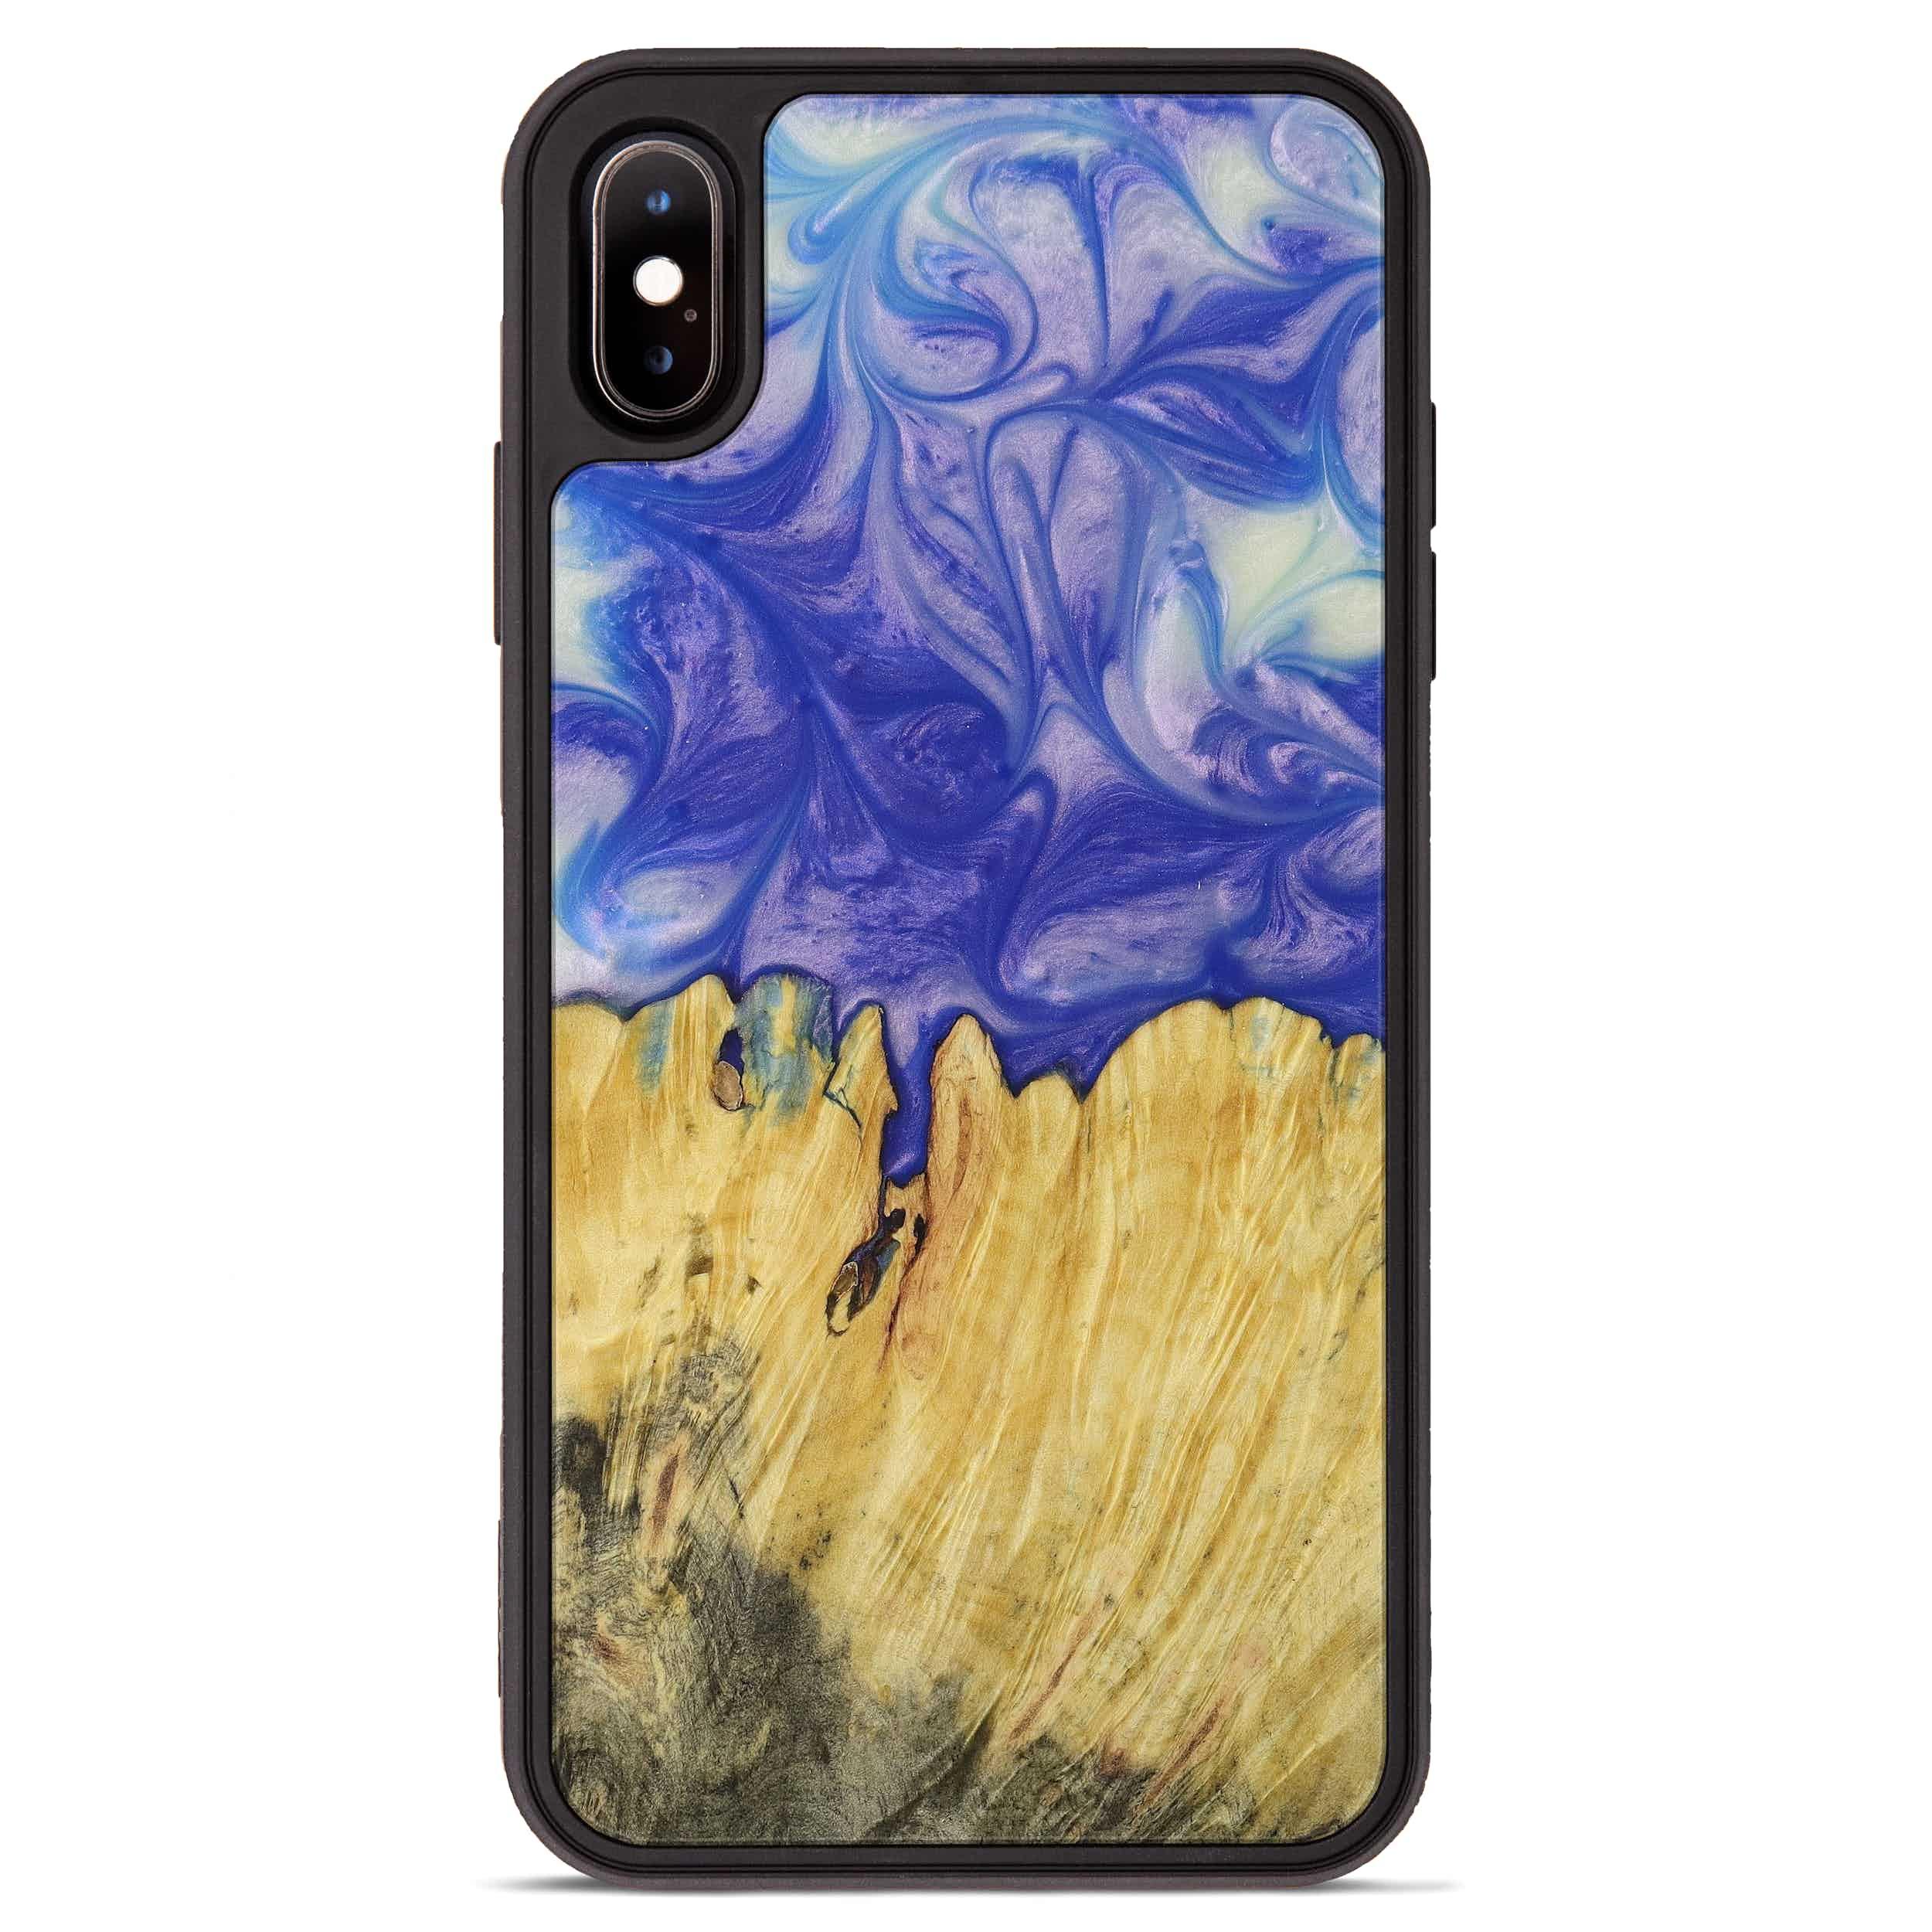 iPhone Xs Max Wood+Resin Phone Case - Advance (Purple, 395915)